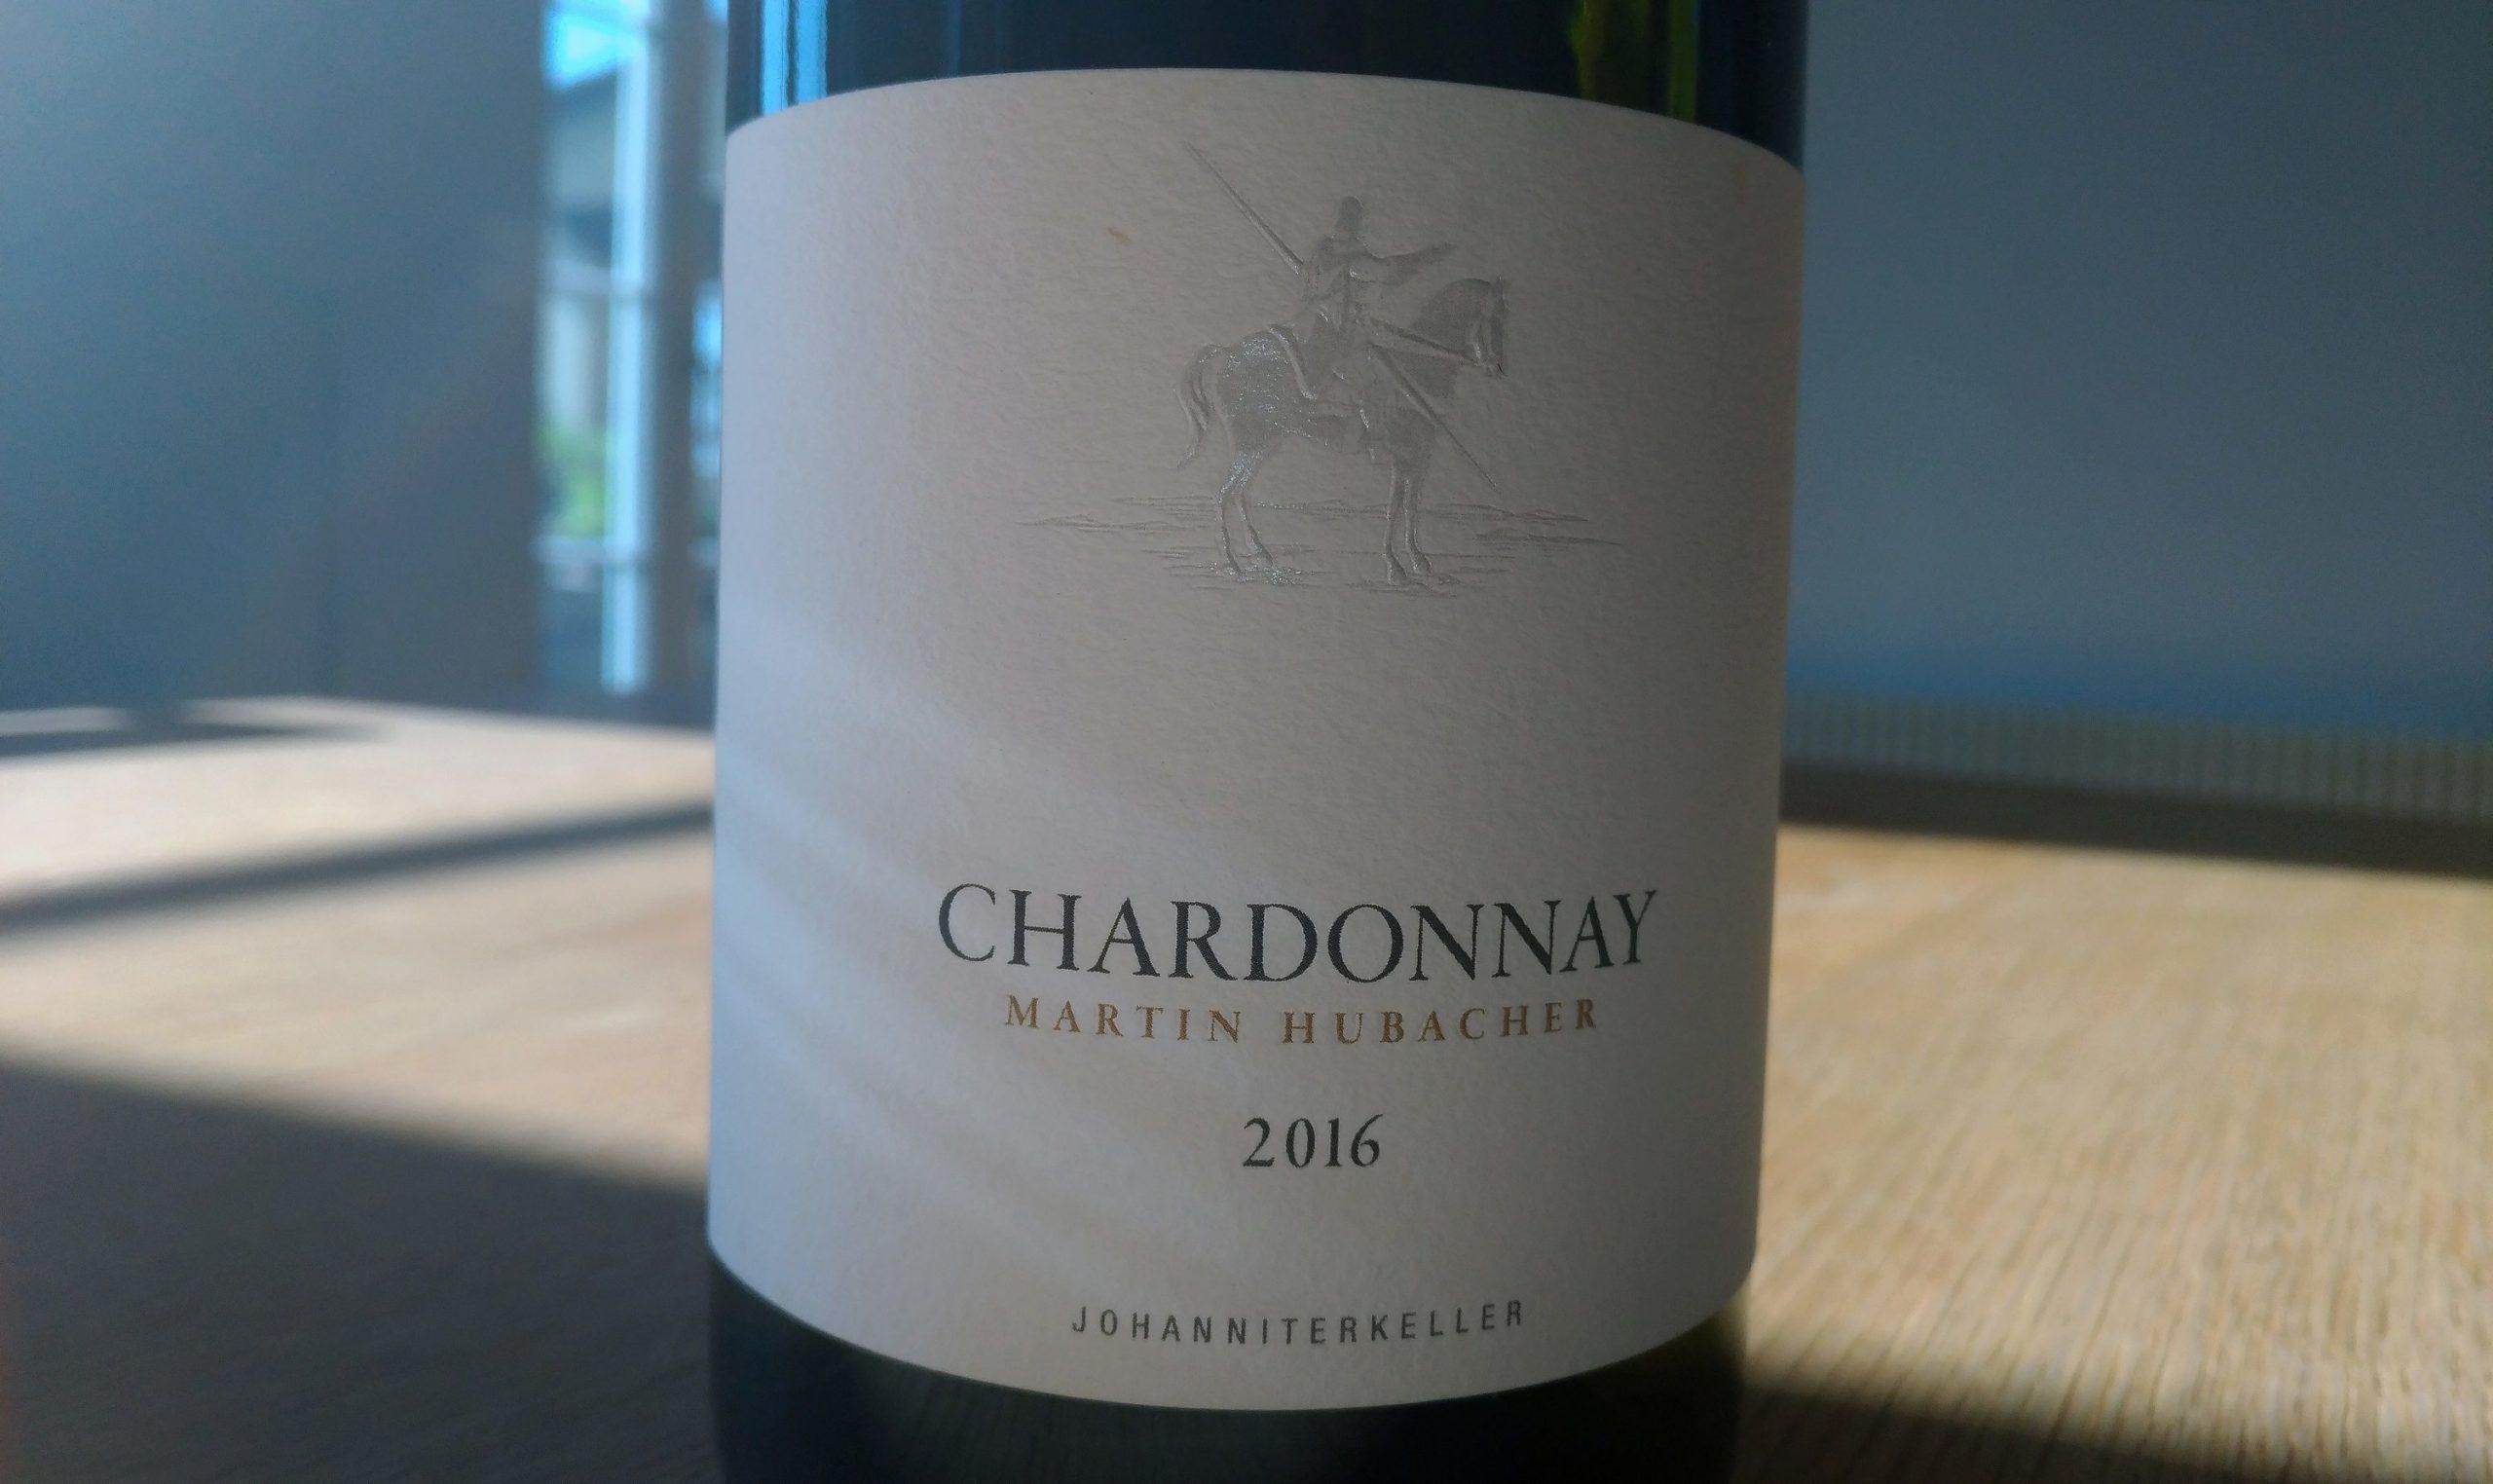 Chardonnay 2016 Martin Hubacher